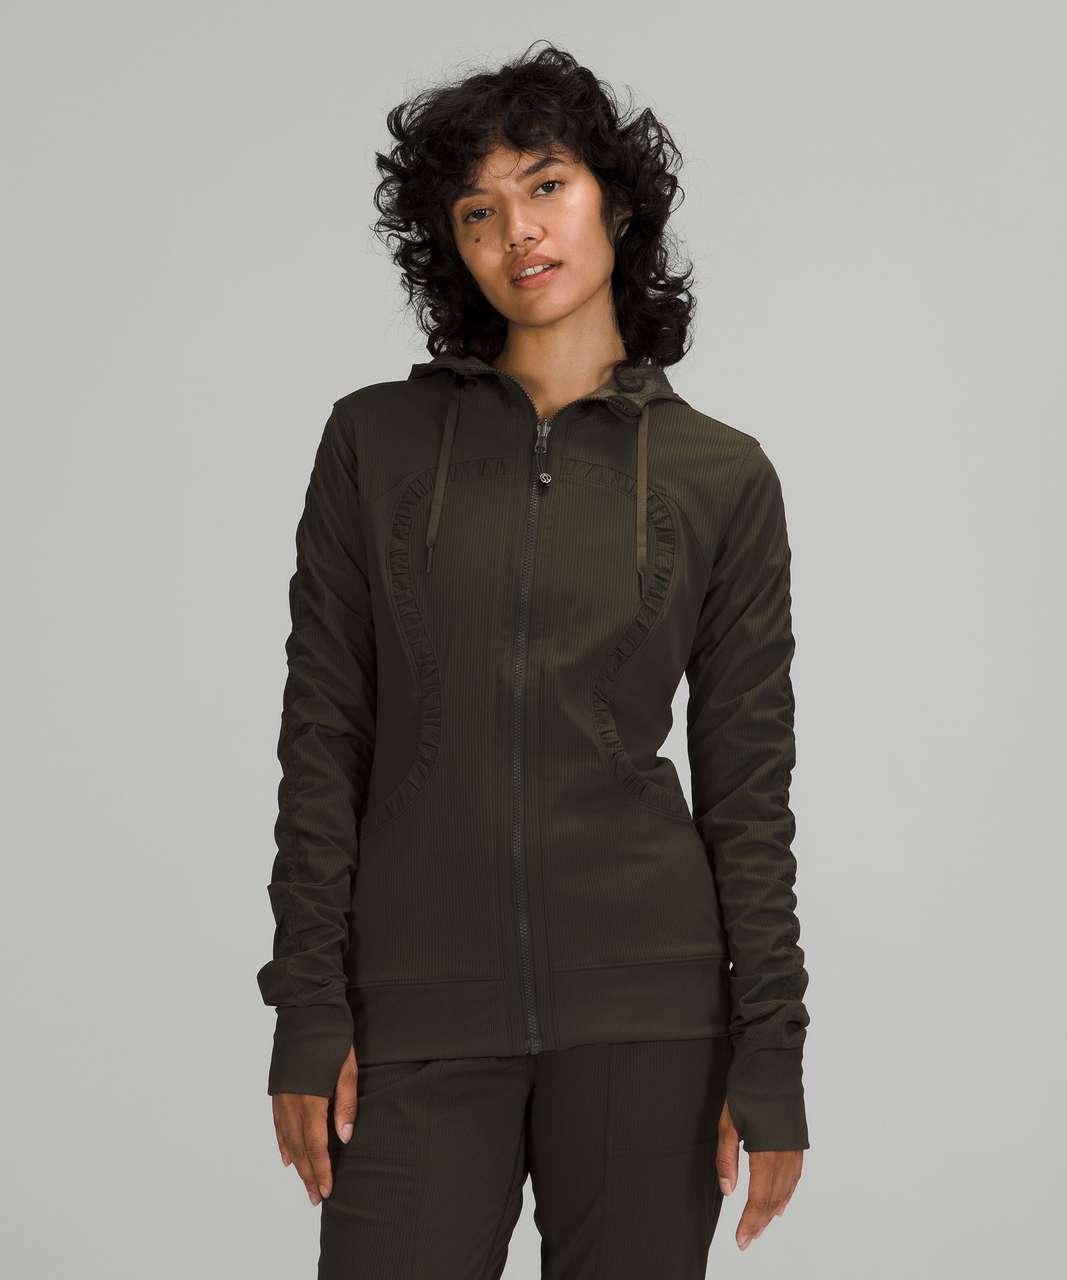 Lululemon Dance Studio Jacket - Dark Olive / Heathered Dark Olive